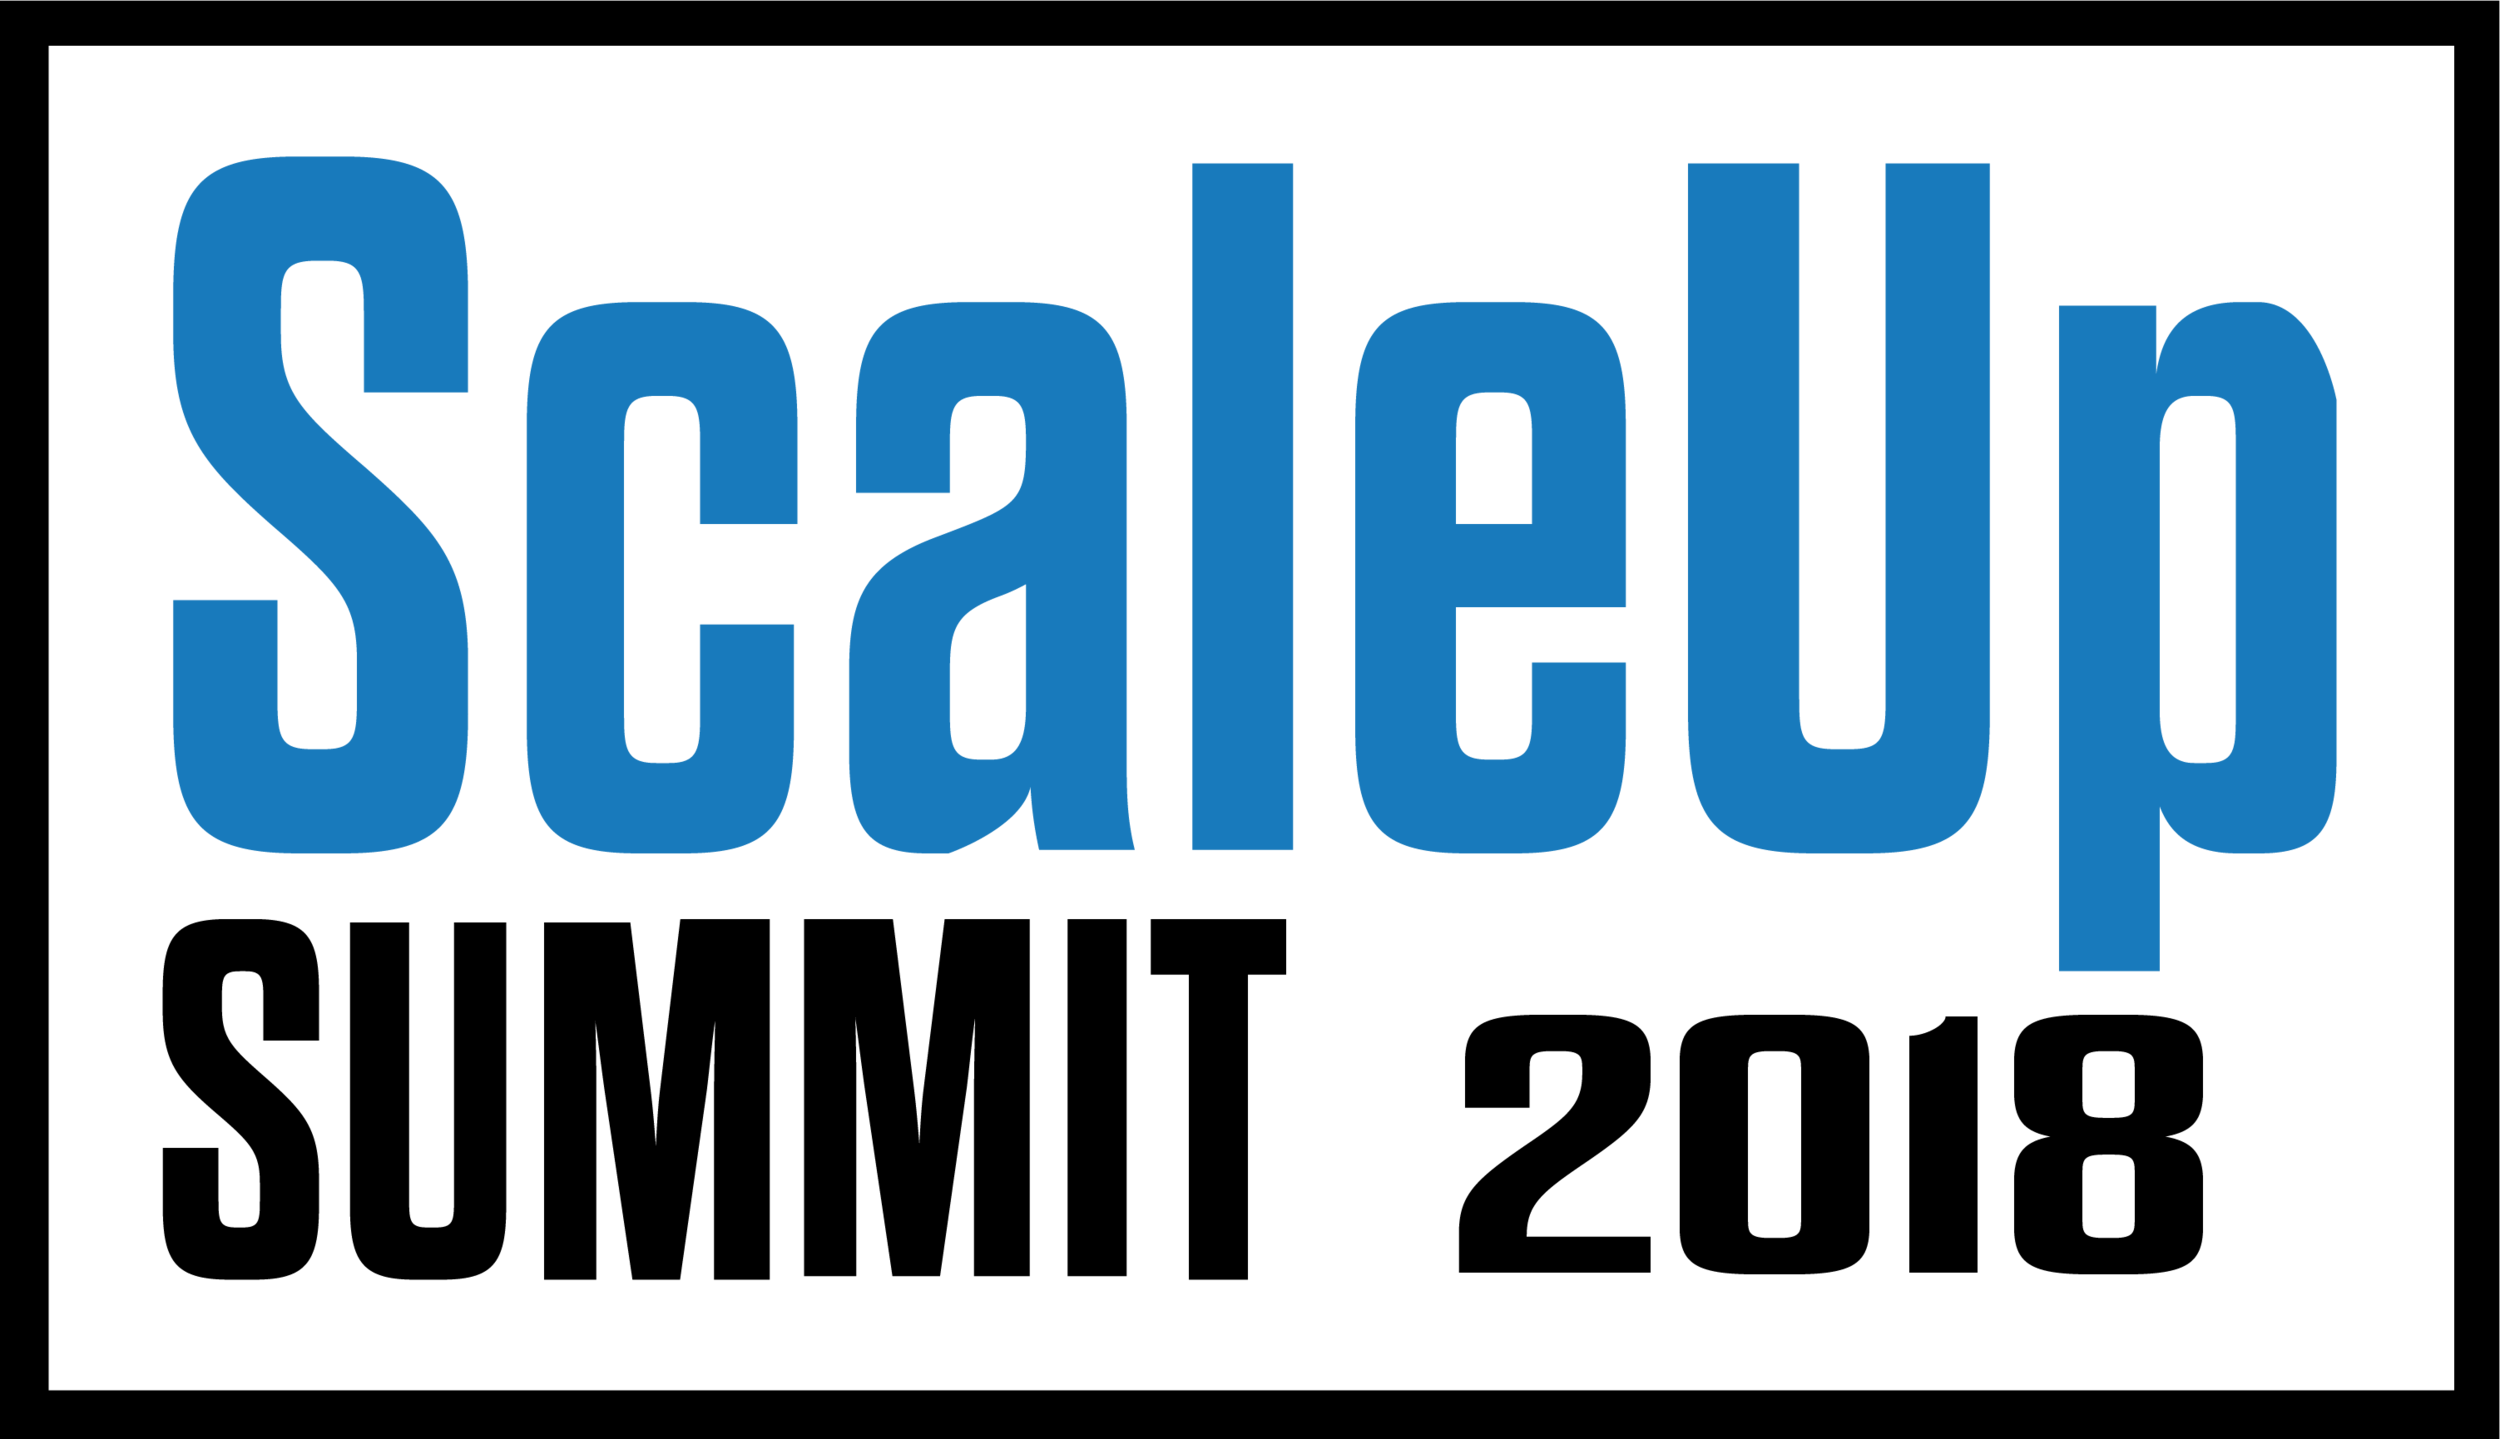 scaleup-blue.png